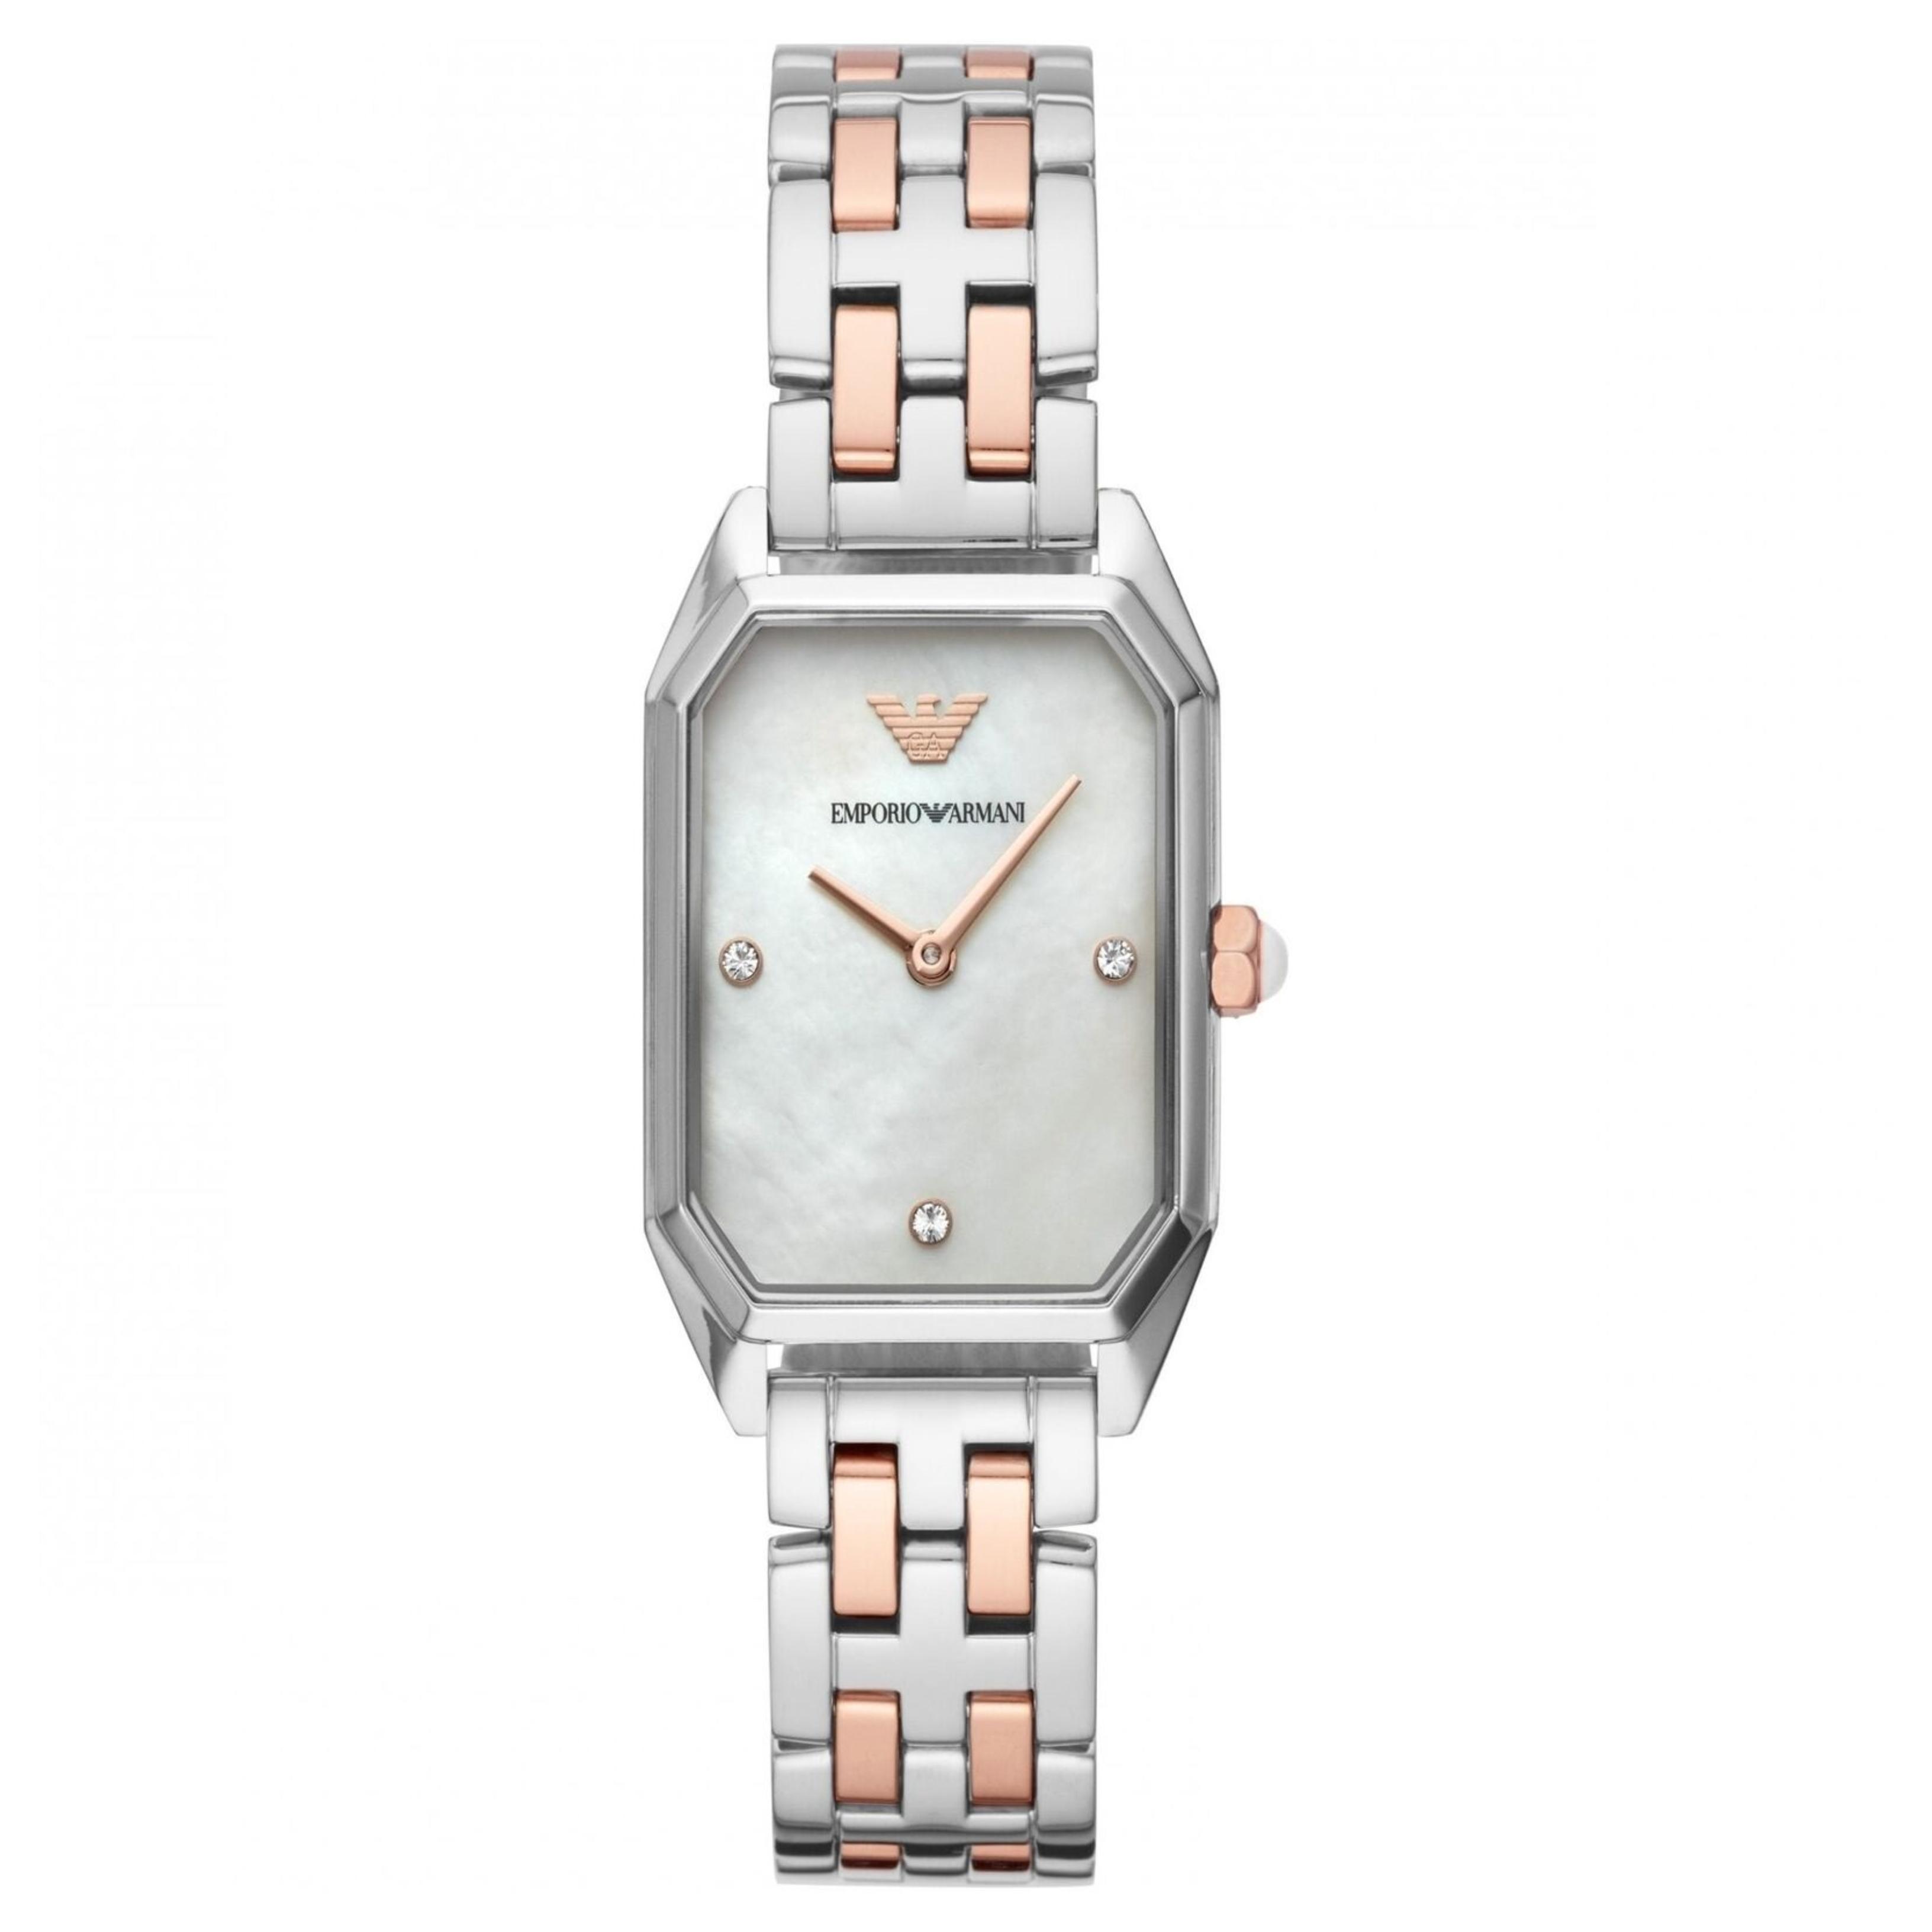 Emporio Armani Gioia Ladies Watch AR11146 | MOP Dial | Dual Tone Stainless Strap